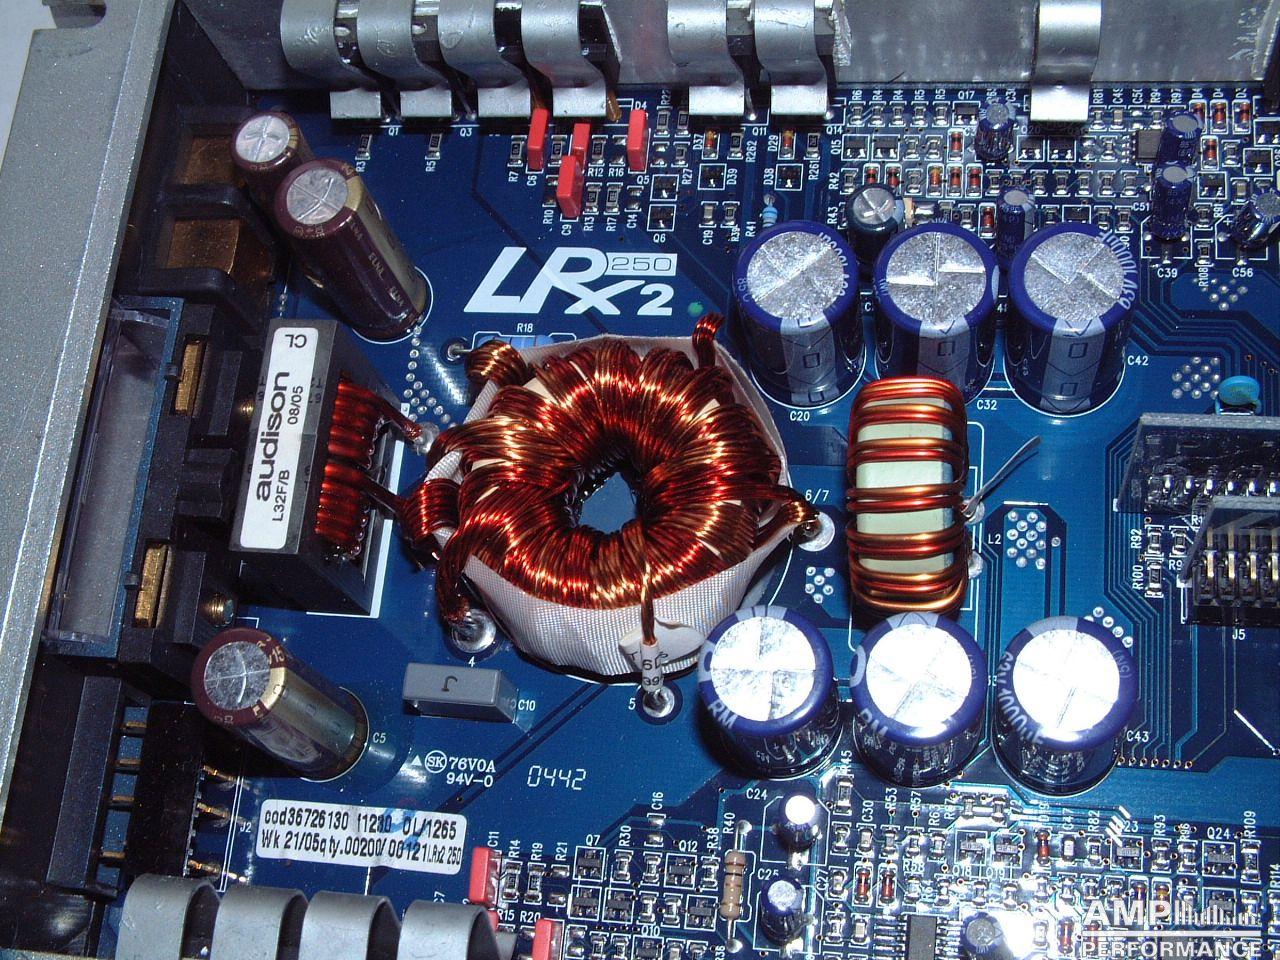 Audison LRX2 250 - AMP Performance